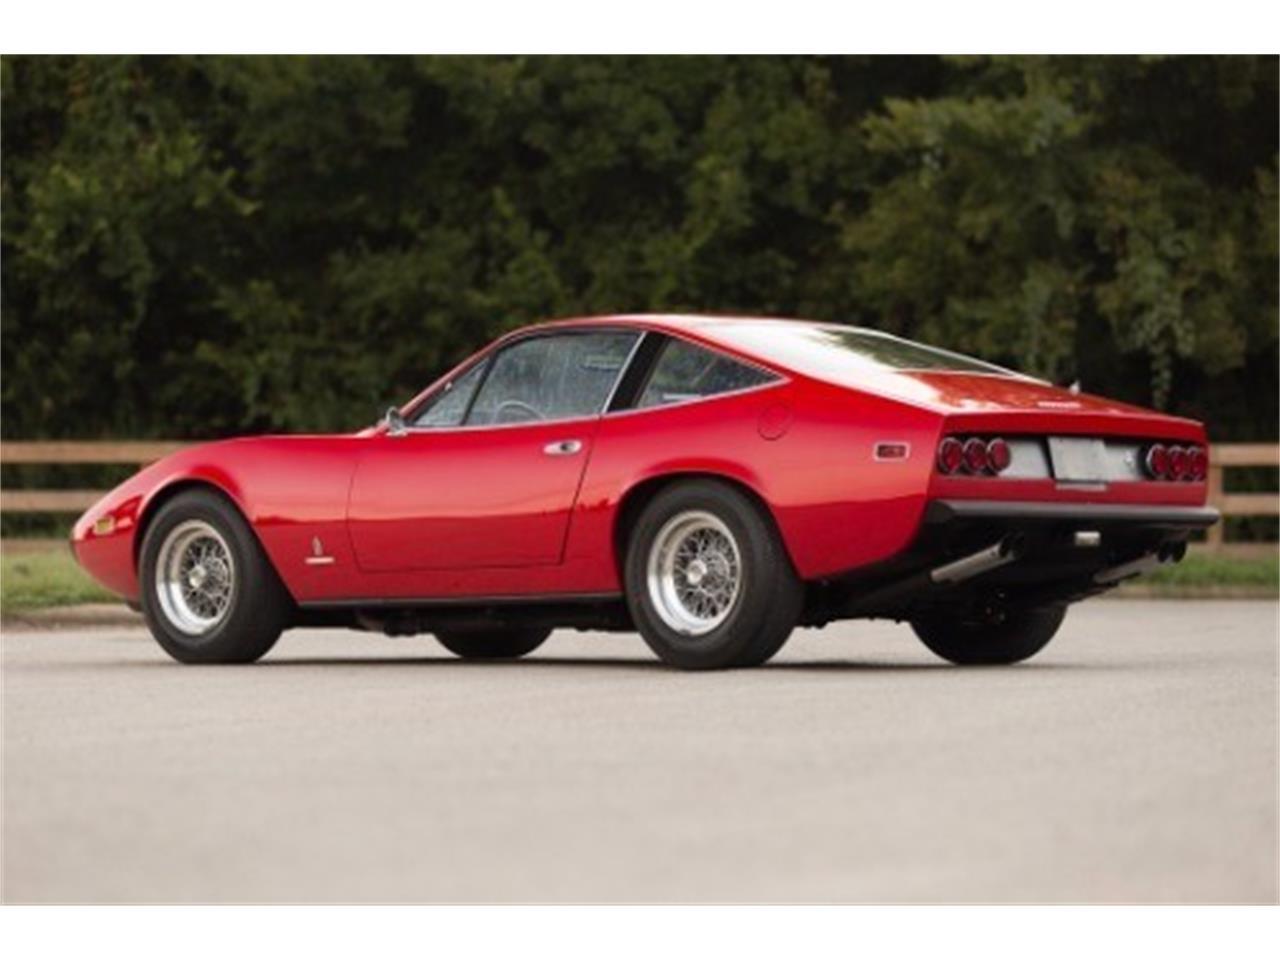 1972 Ferrari 365 GTC/4 (CC-1320258) for sale in Astoria, New York